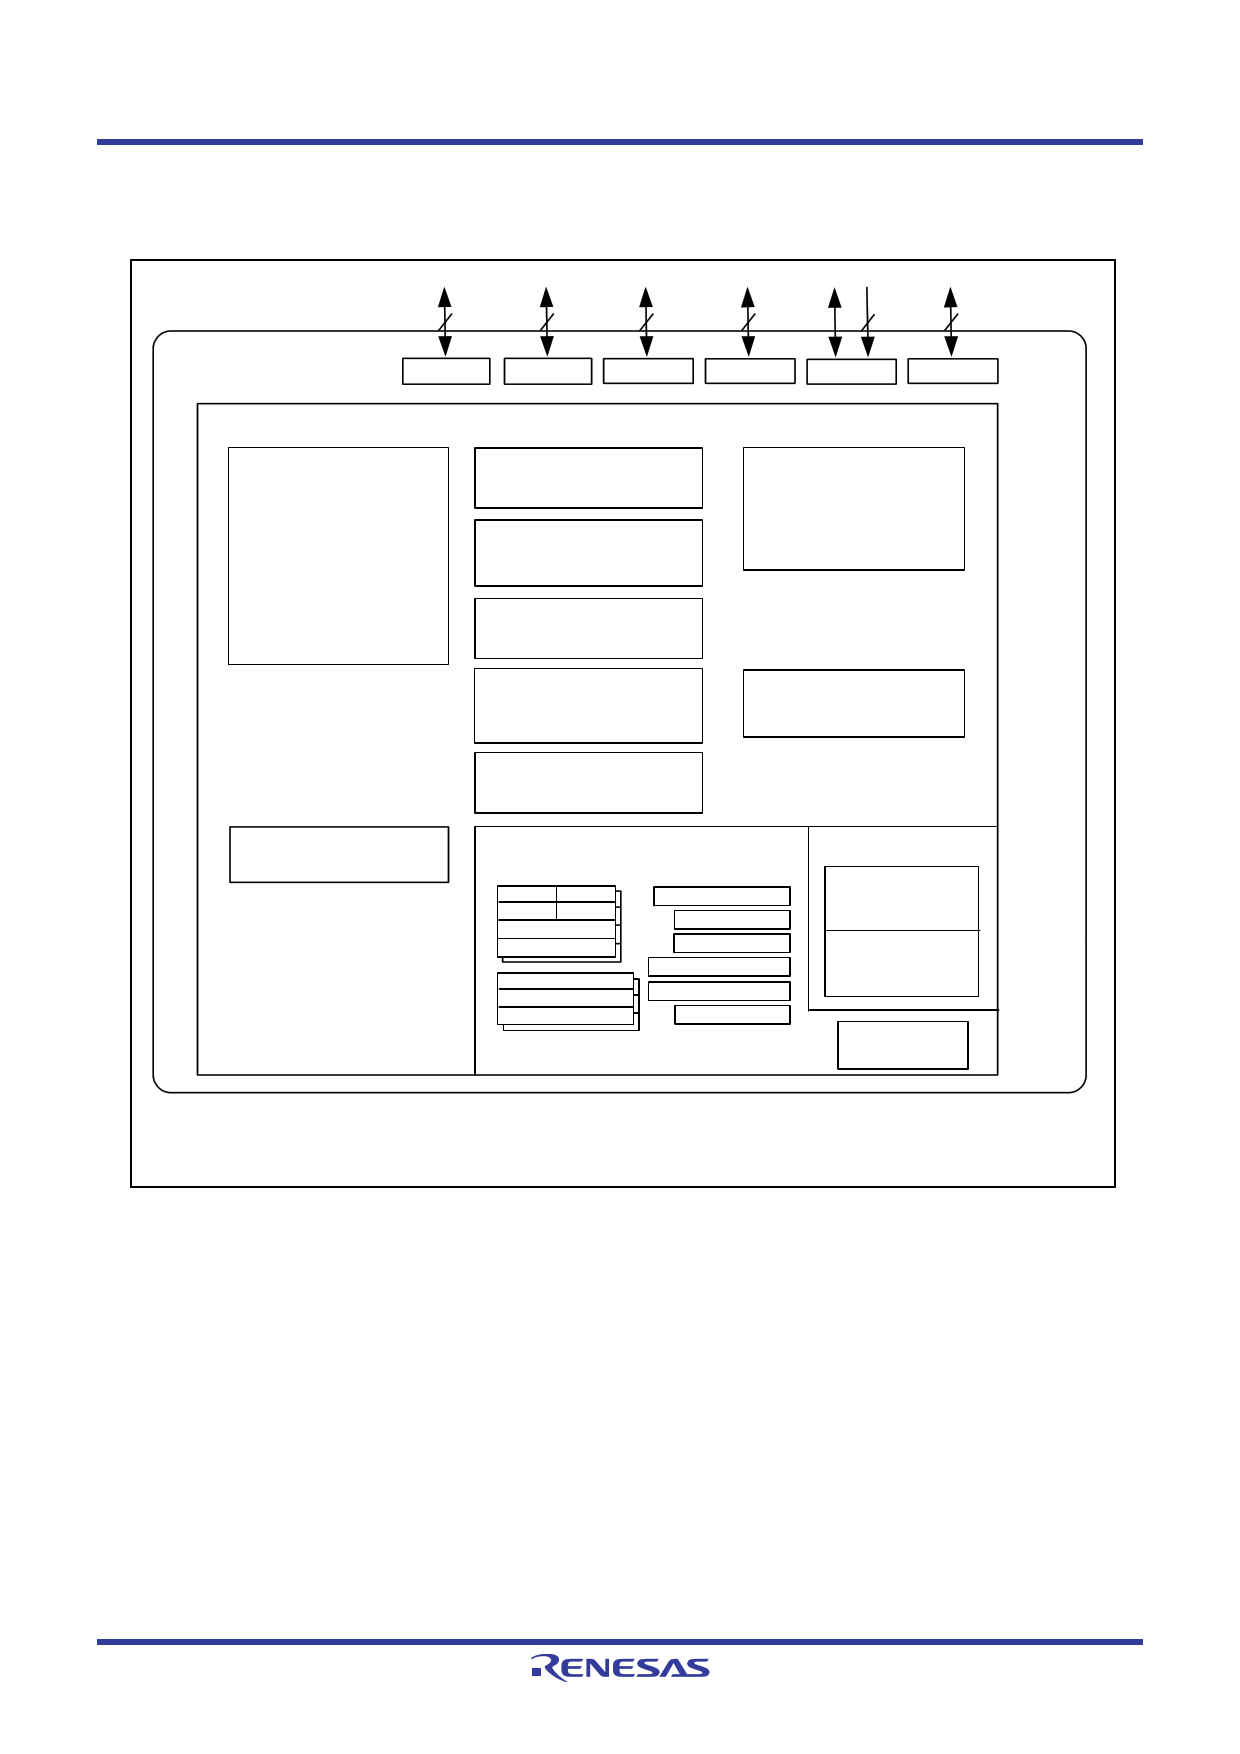 R5F2123CKFP pdf, 반도체, 판매, 대치품